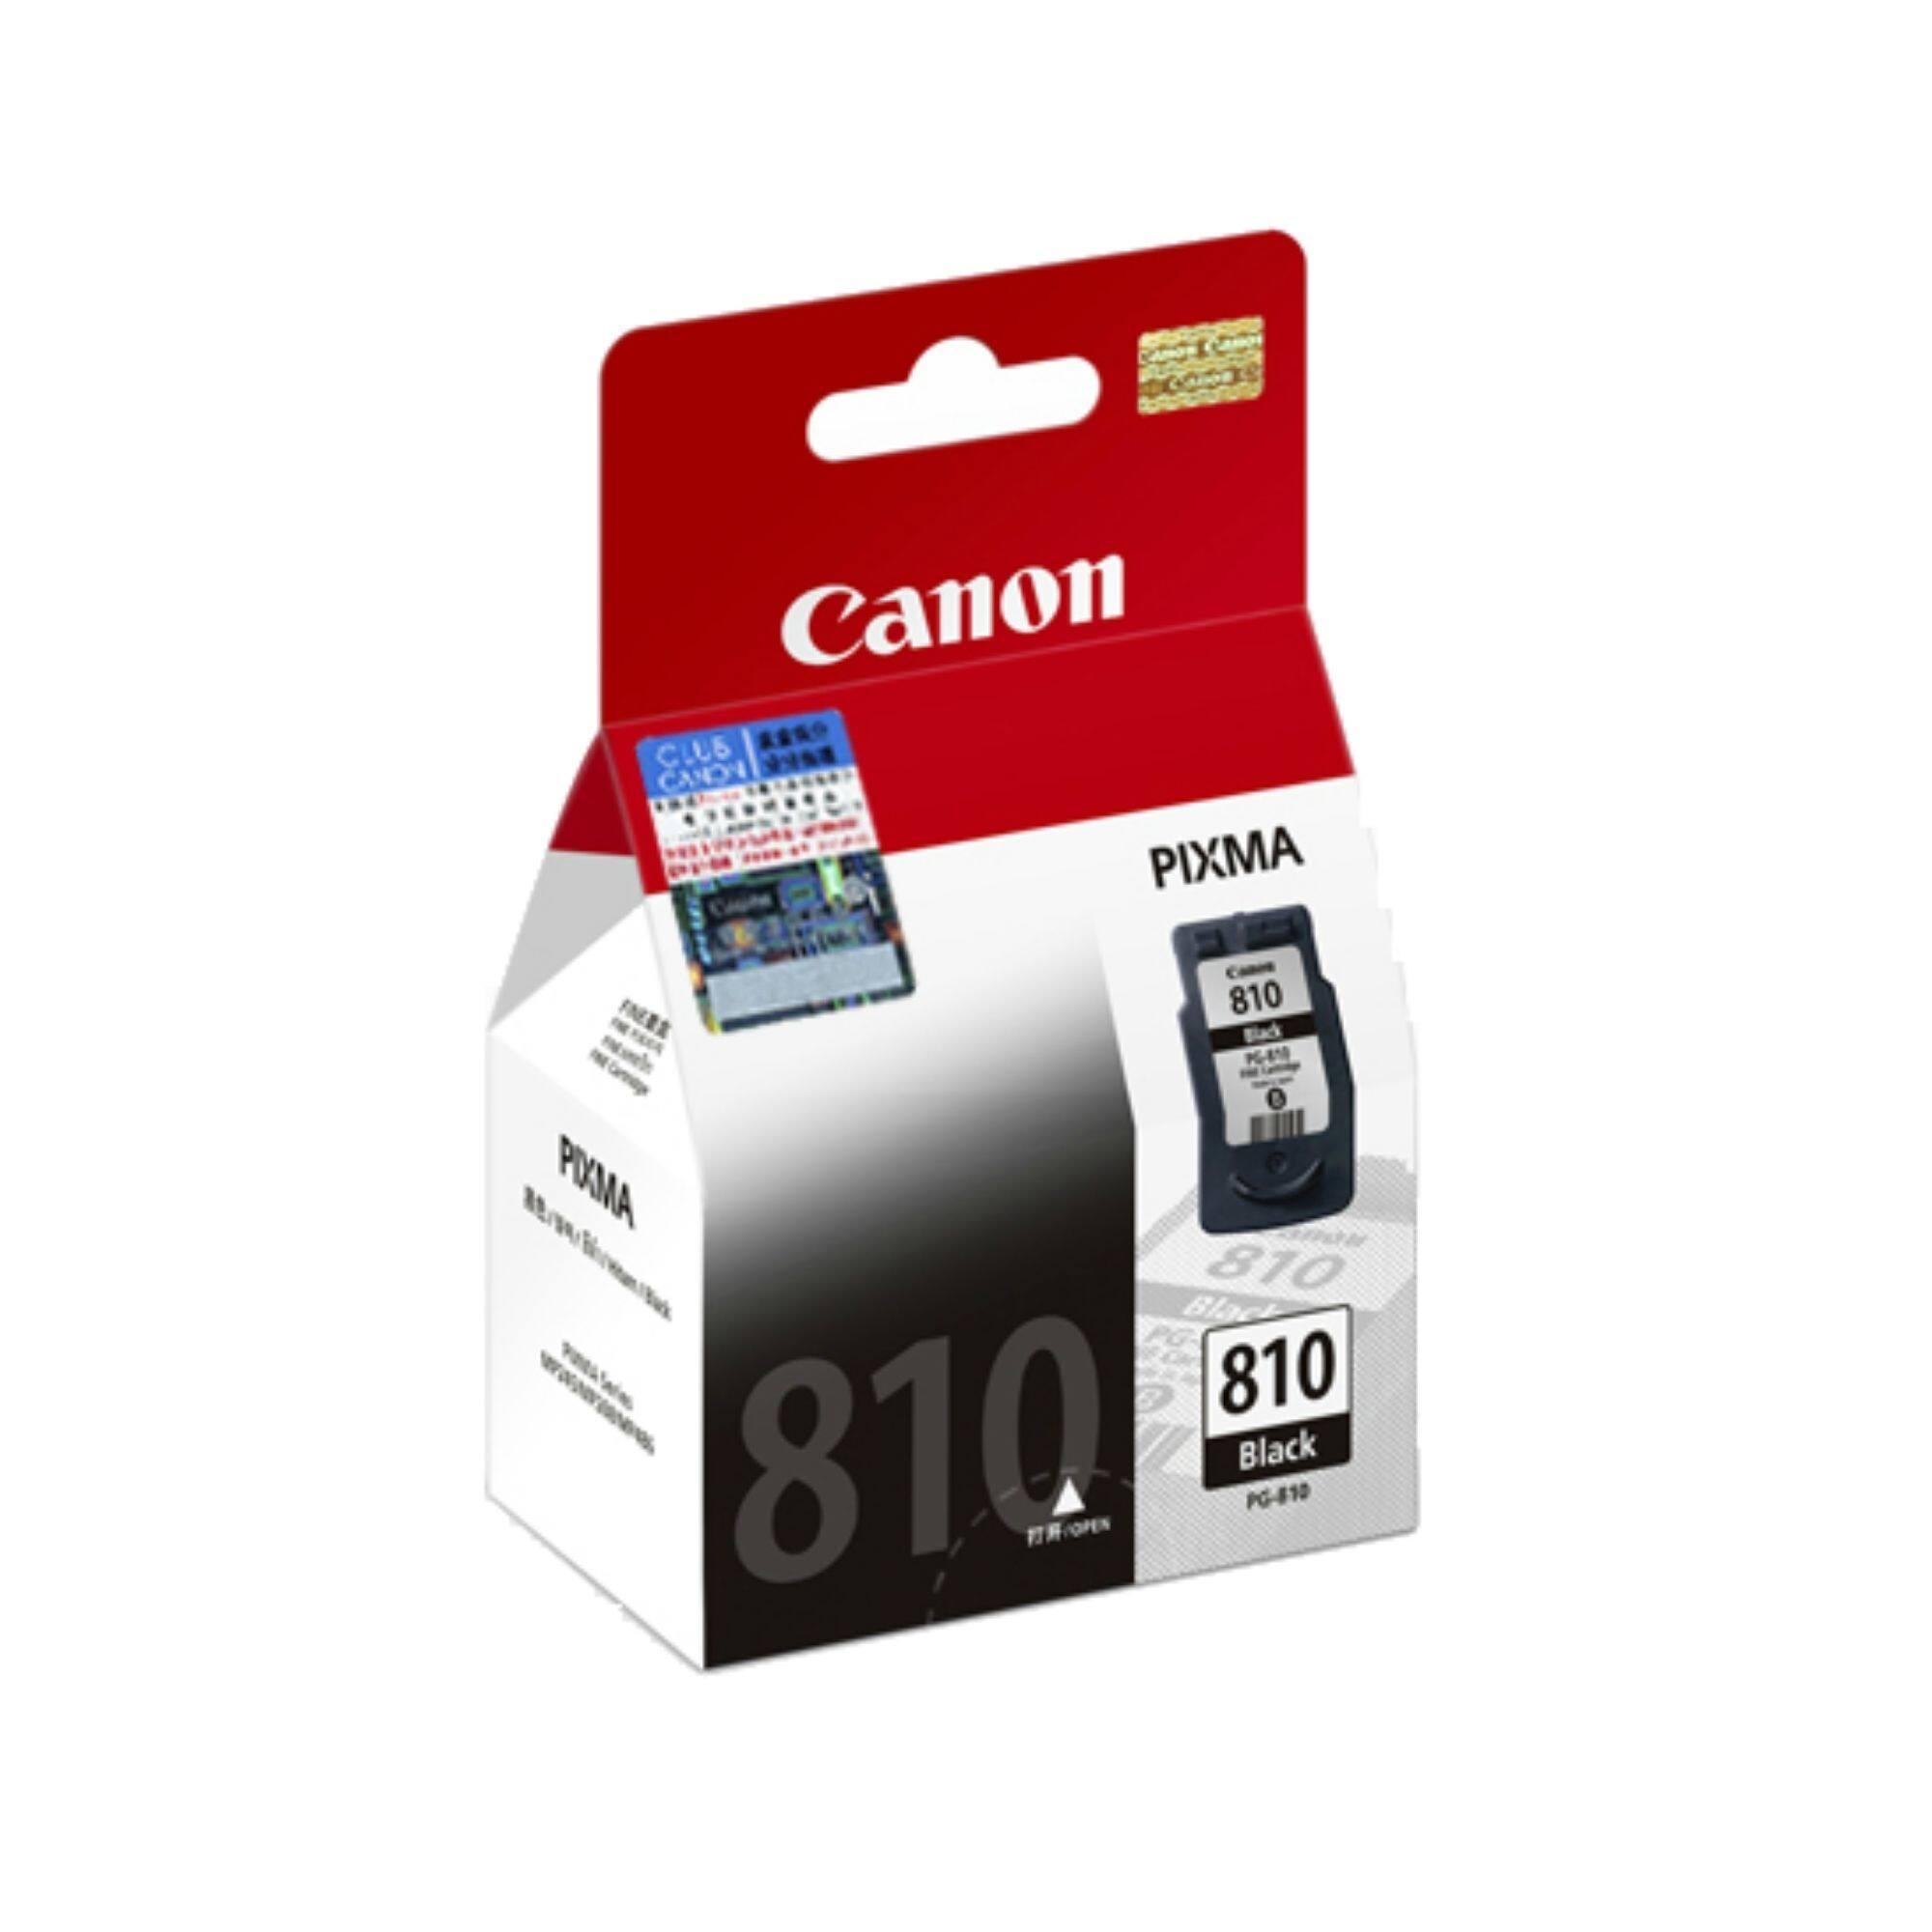 CANON PG-810 BLACK 9ML CARTRIDGE for iP2770/2772, MP245/237/258/287/486/496/497, MX328/338/347/357/366/416/426 Printer